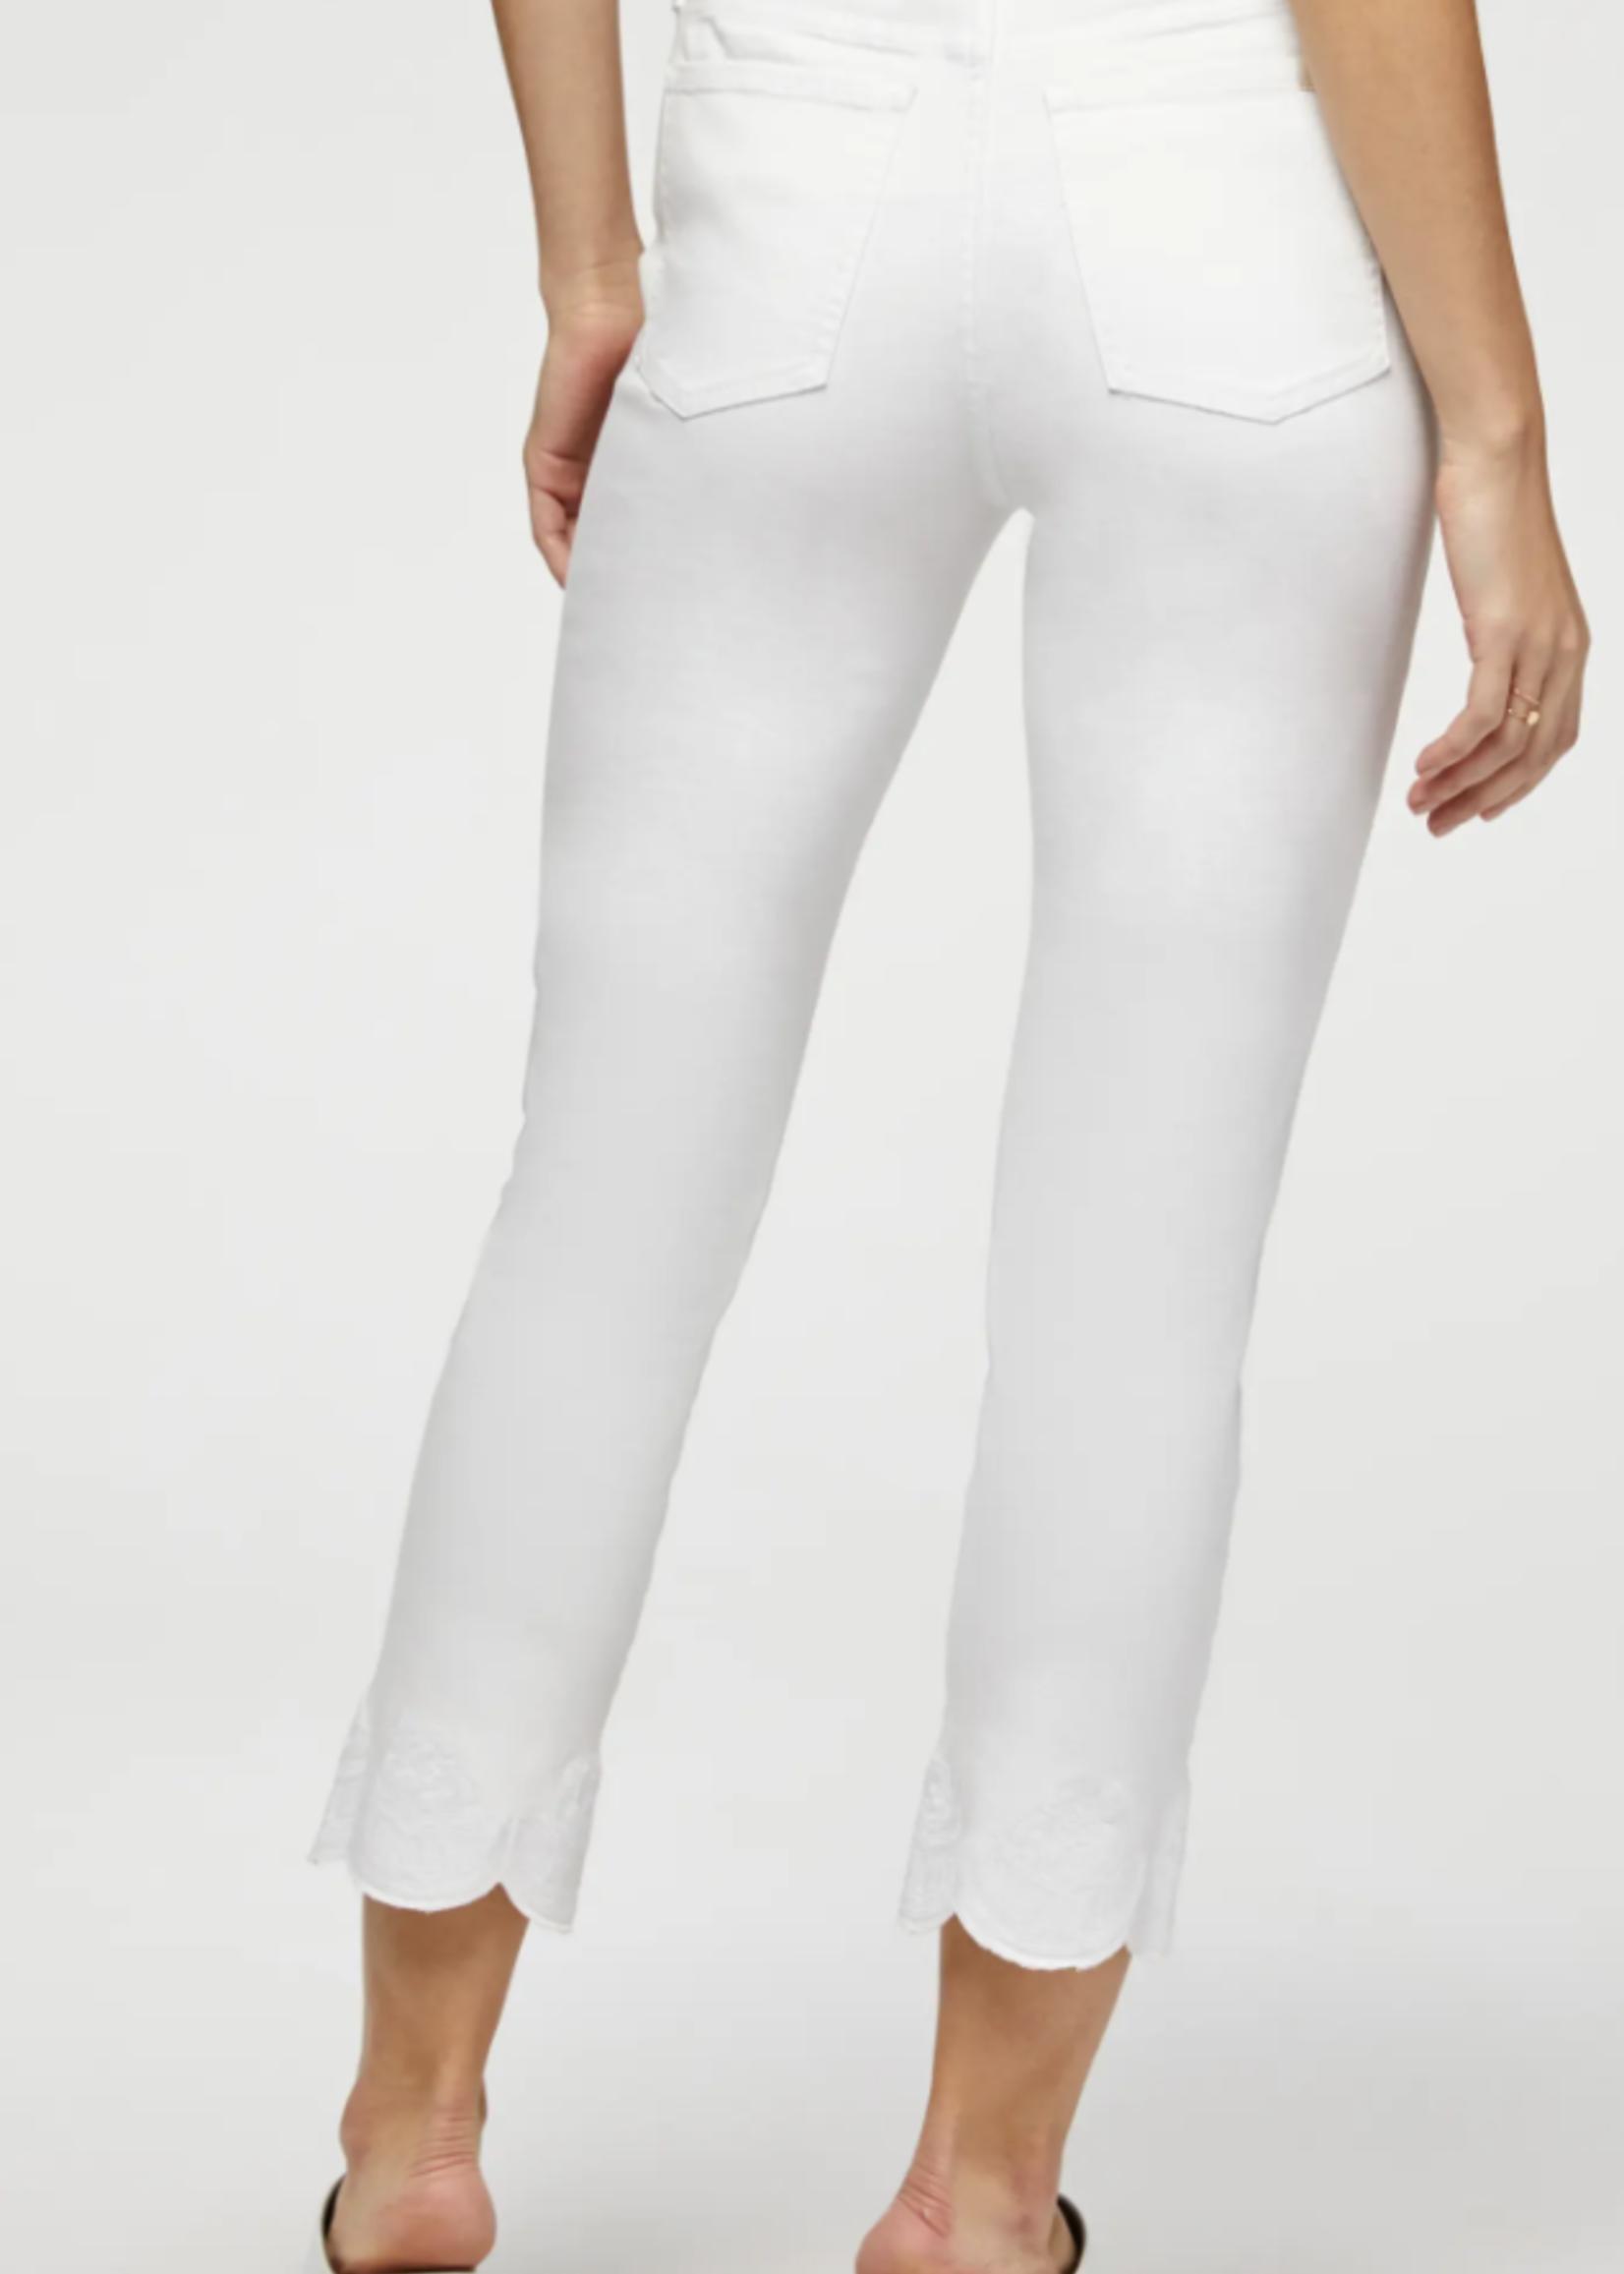 Jen7 Jen7 Embroidered Scallop Hem Crop Straight Leg Jeans